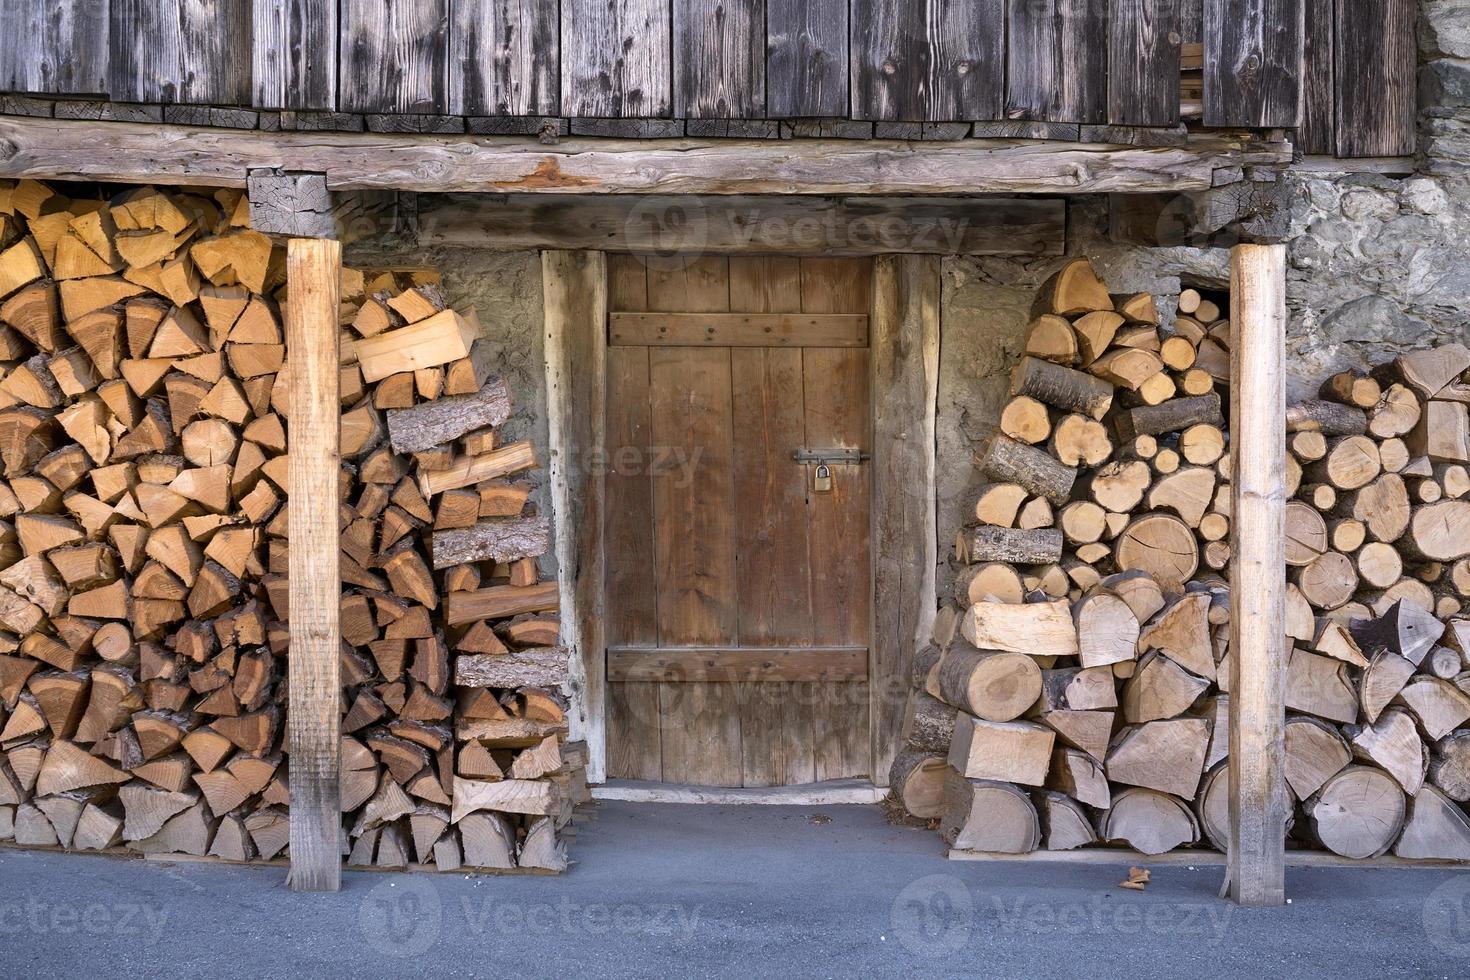 Feuerholz vor Scheunentor gestapelt. foto